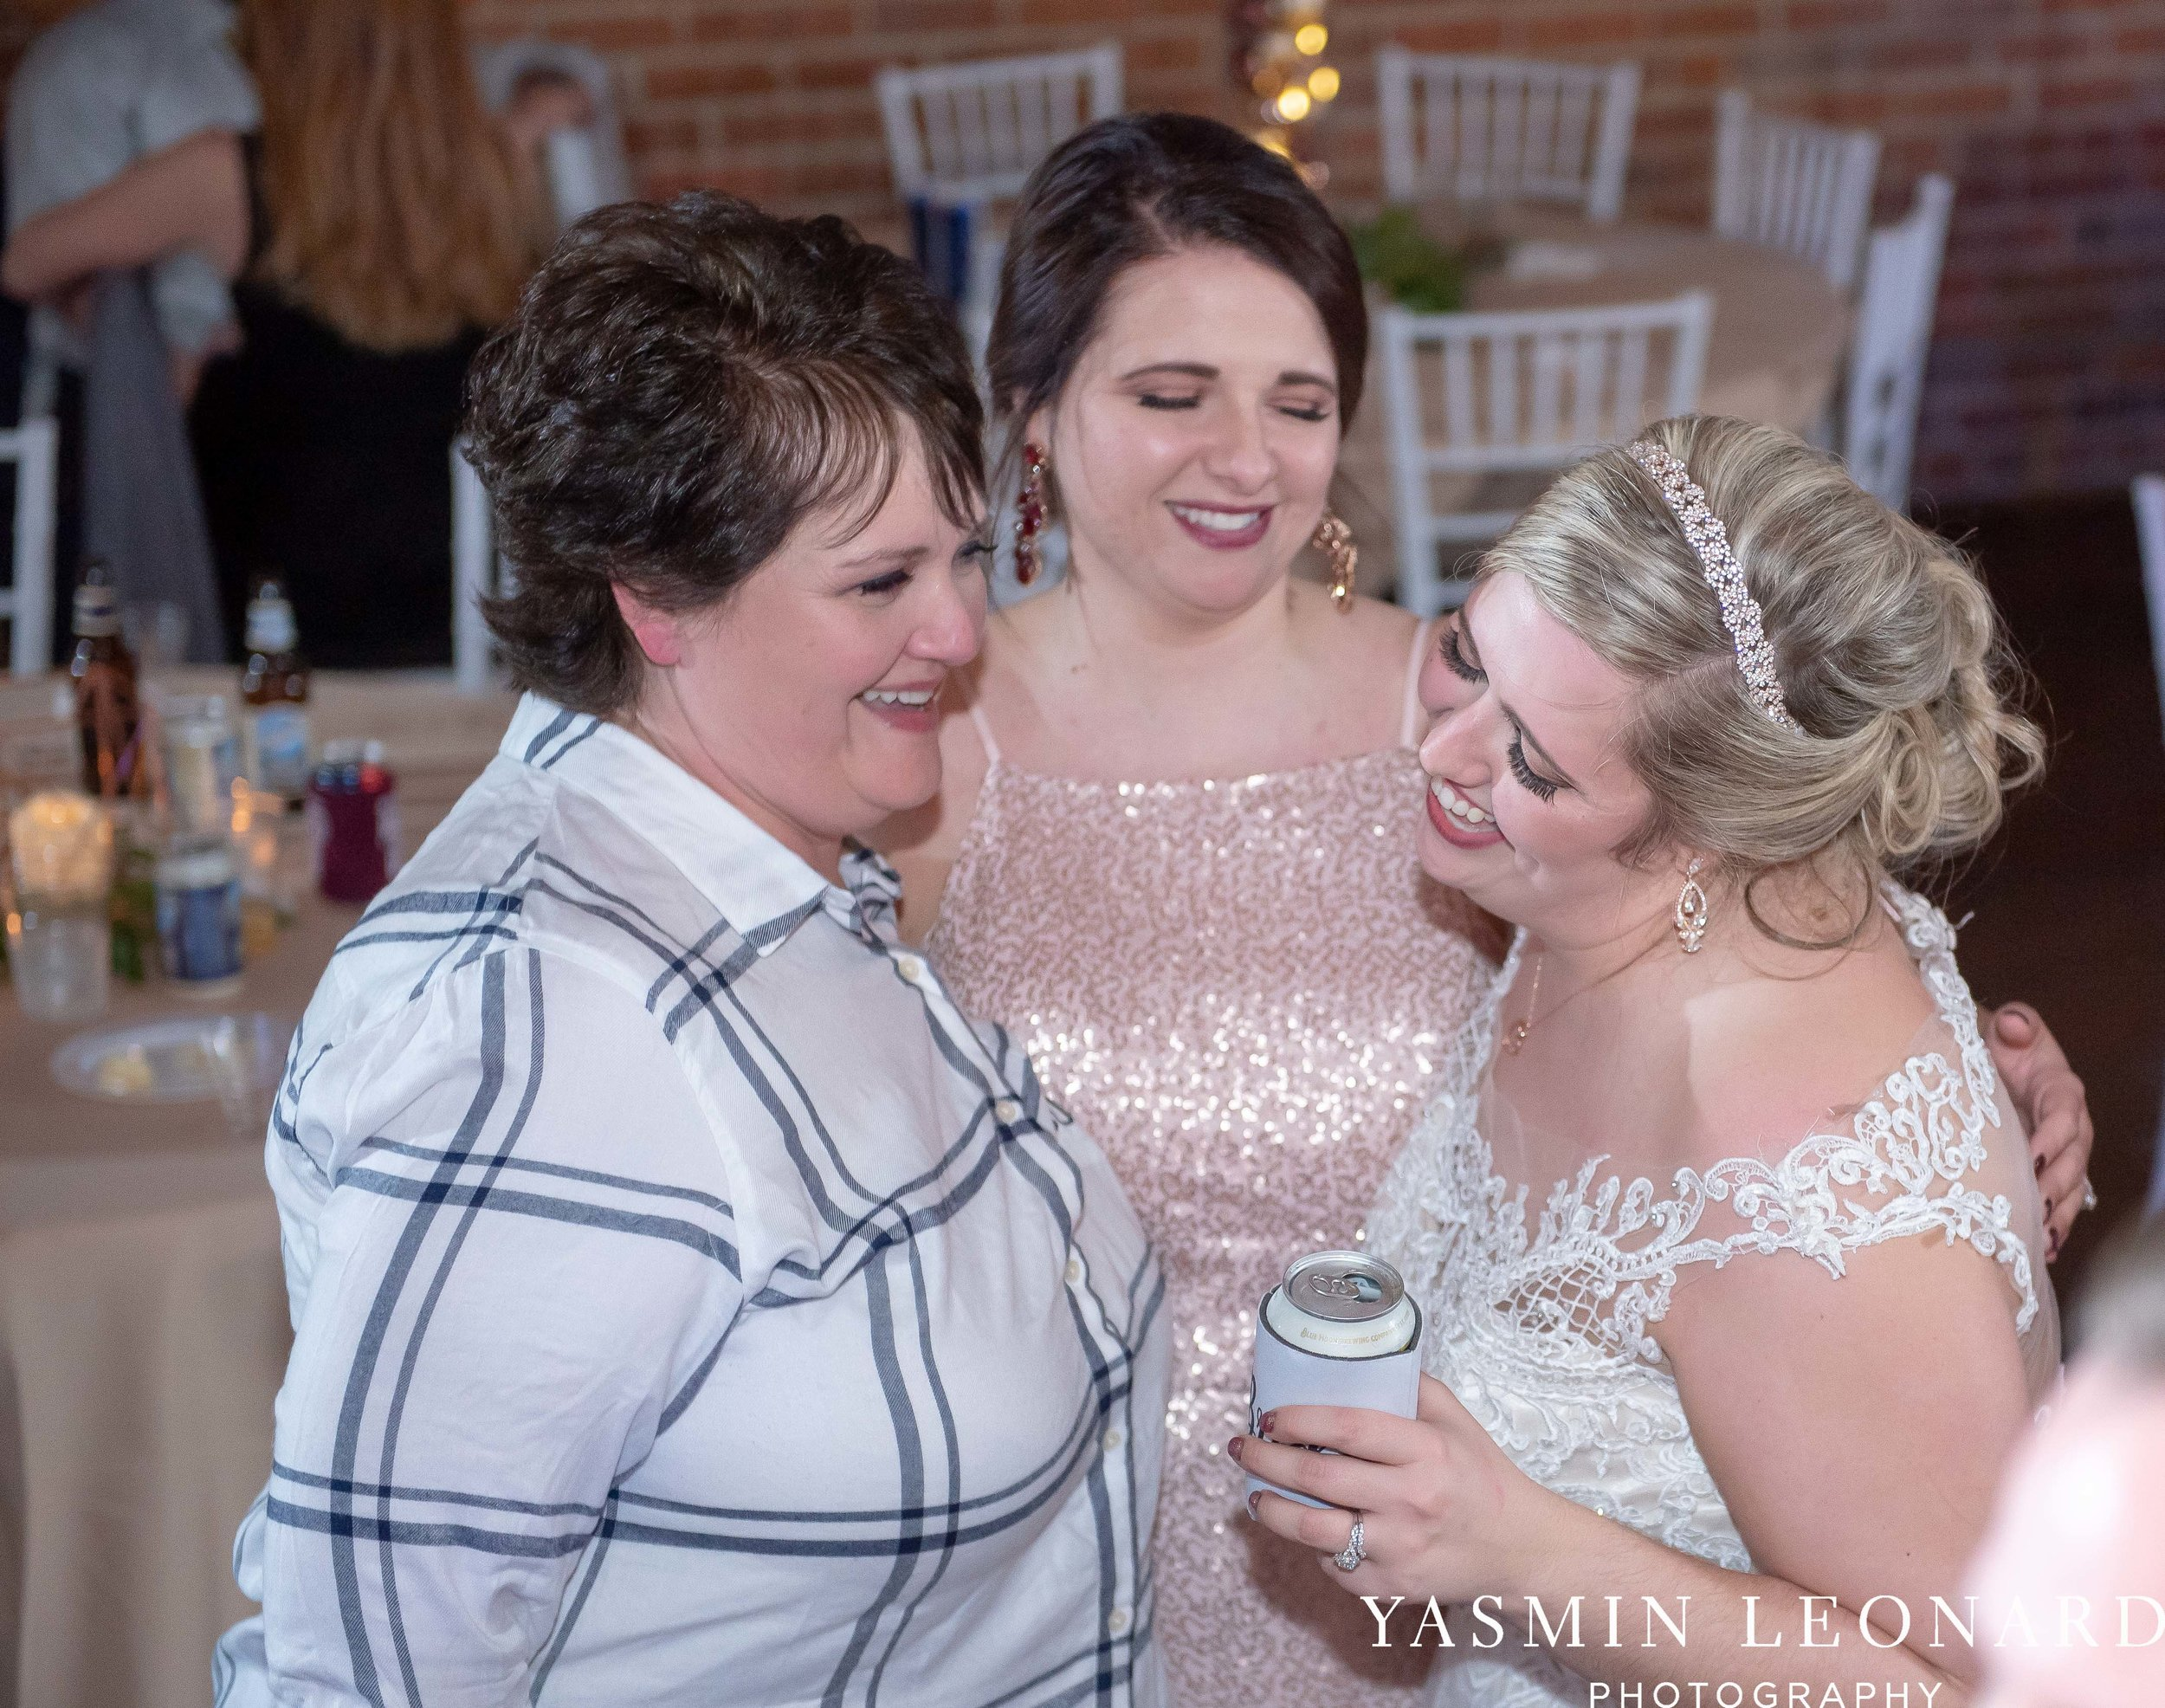 Rebekah and Matt - 105 Worth Event Centre - Yasmin Leonard Photography - Asheboro Wedding - NC Wedding - High Point Weddings - Triad Weddings - Winter Wedding-75.jpg